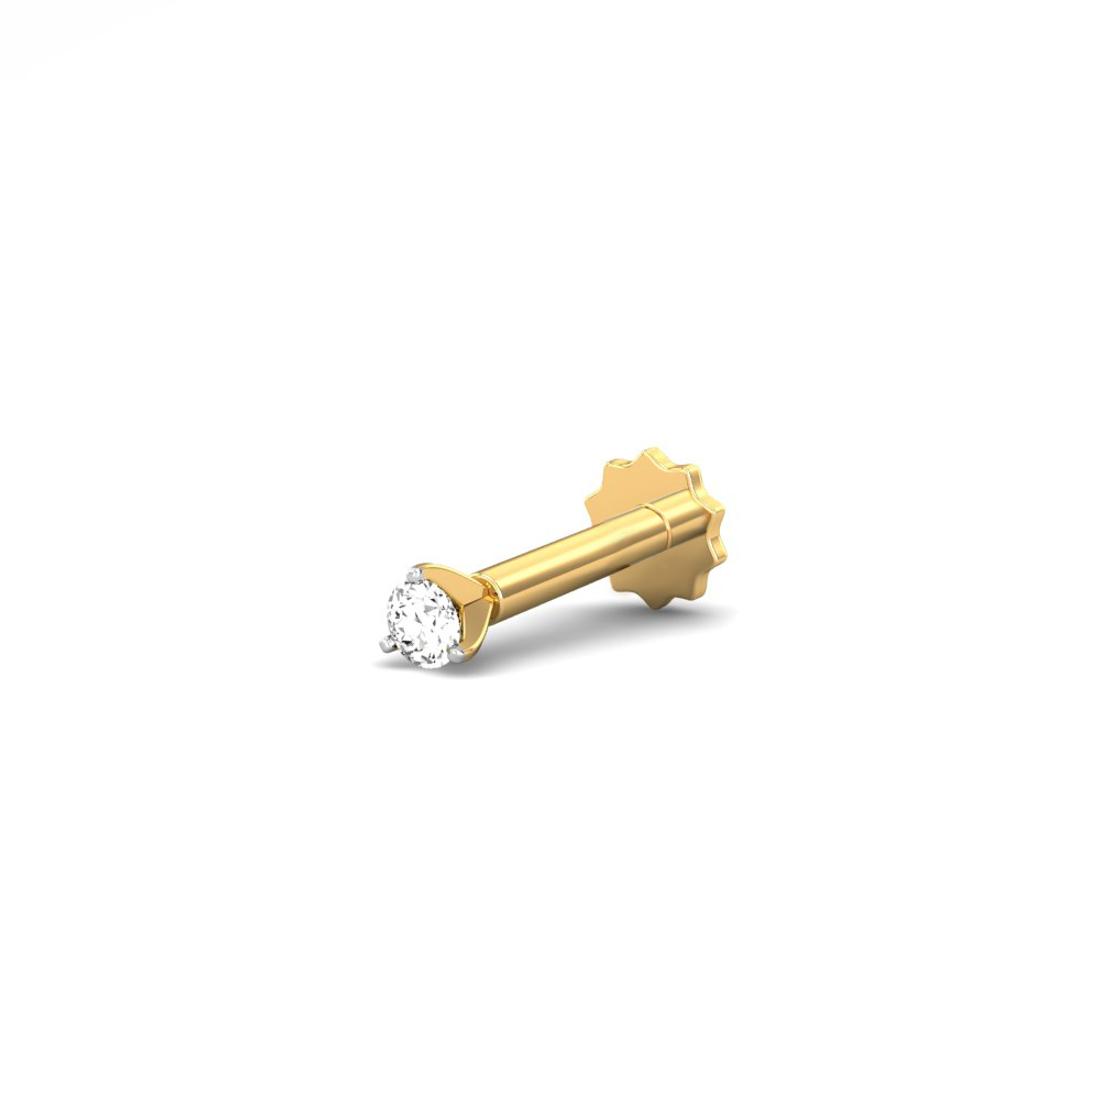 Jewel samarth 18k(750)Yellow Gold and 0.03 ct.(IGI Certified Diamonds) Nose pin